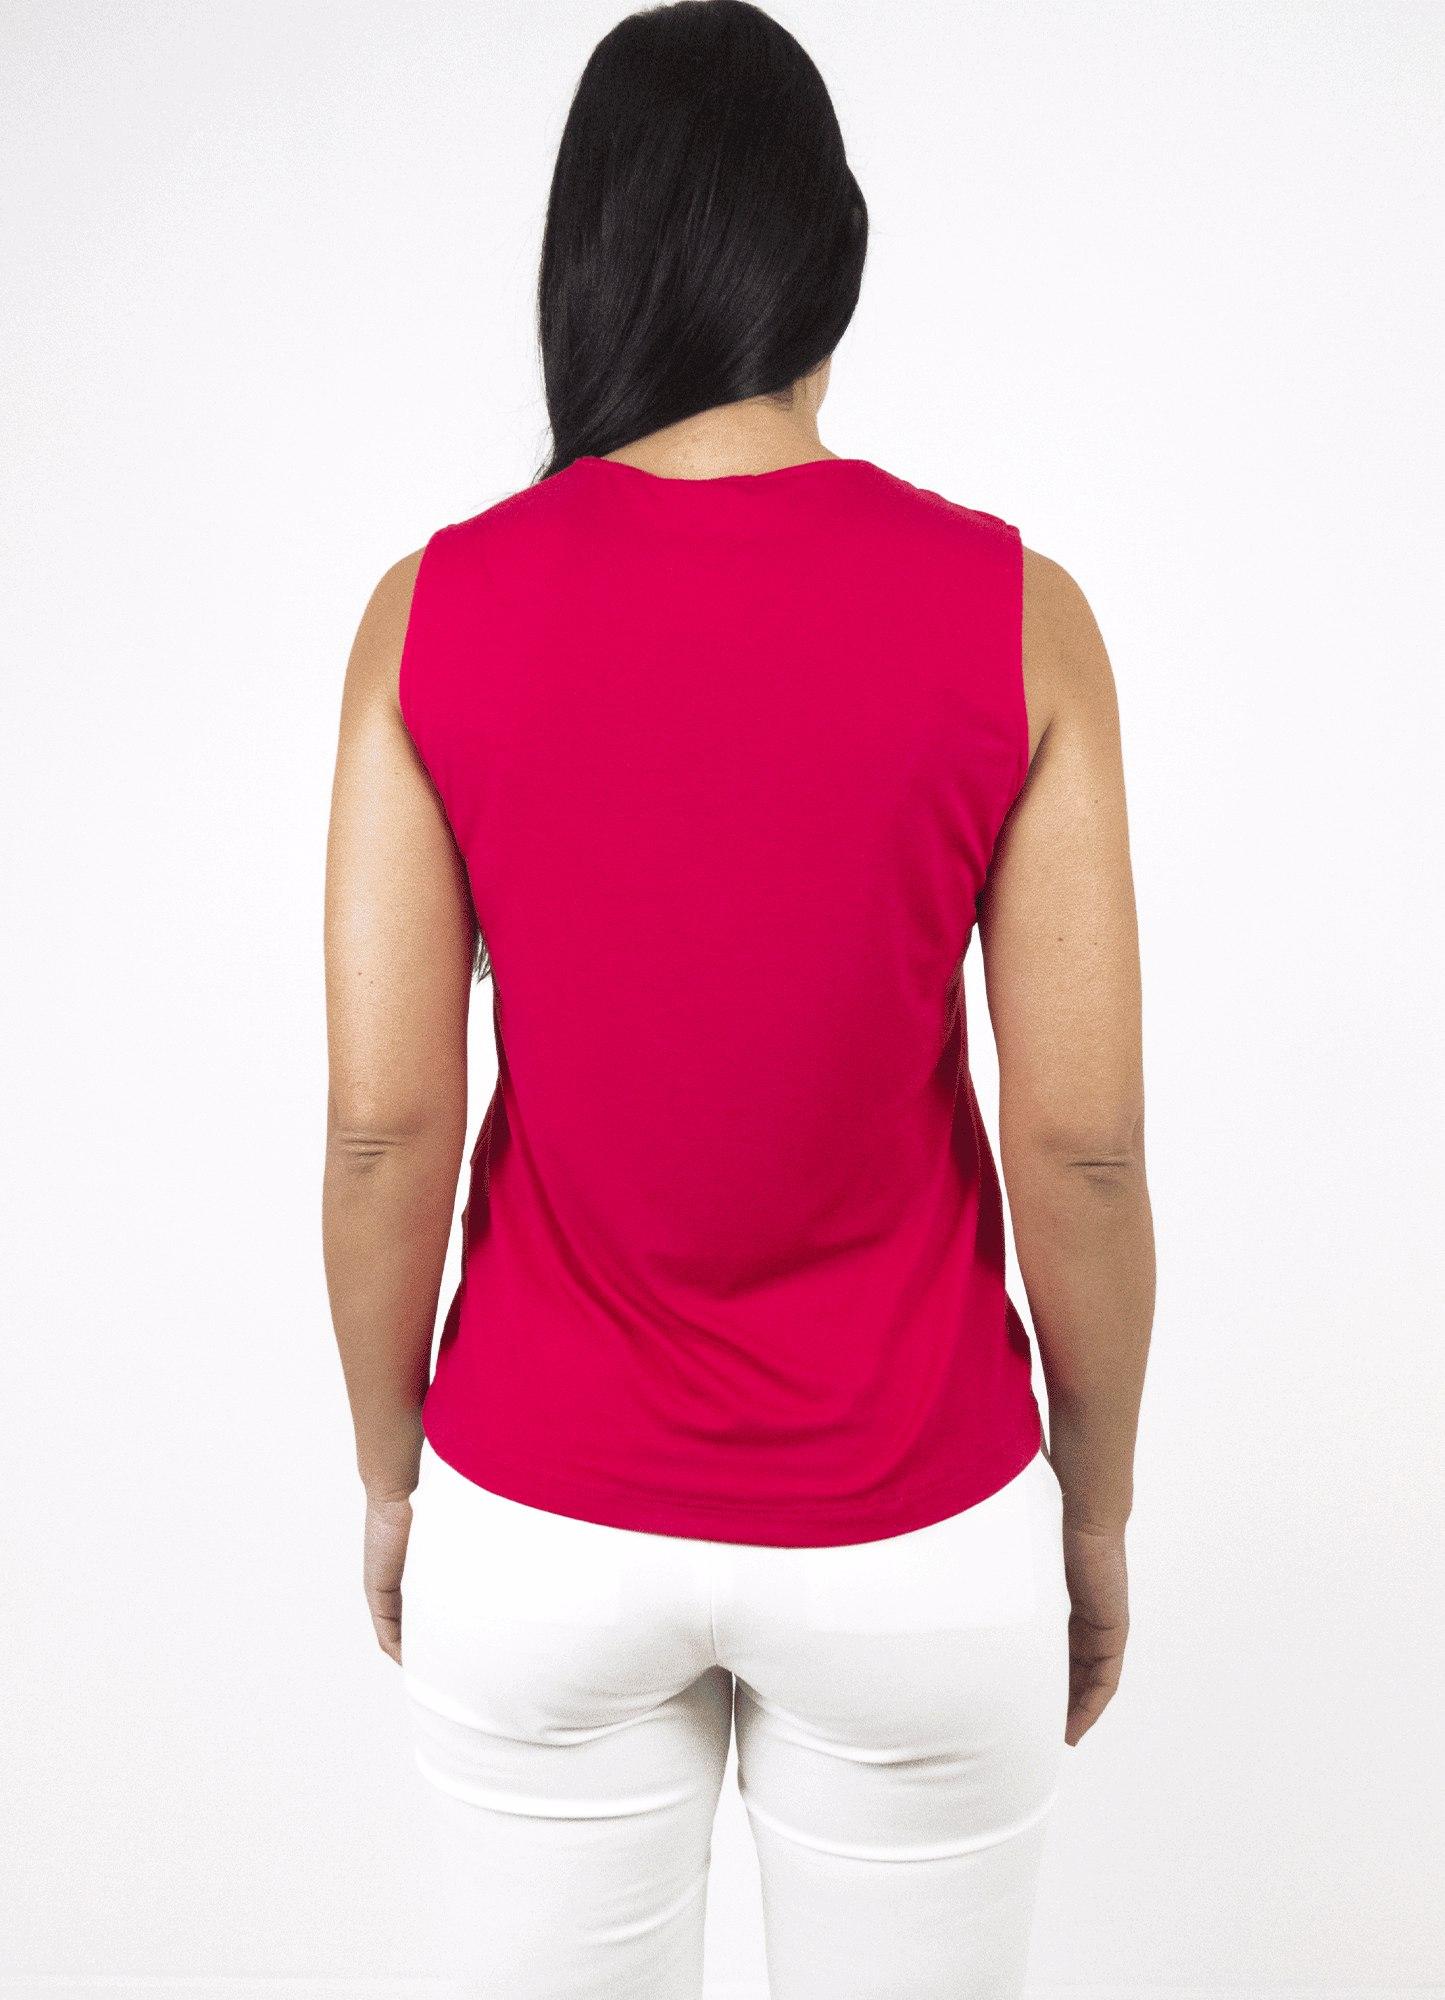 Blusa Feminina Malha Rosa Decote Redondo Botão Decorativo no Ombro